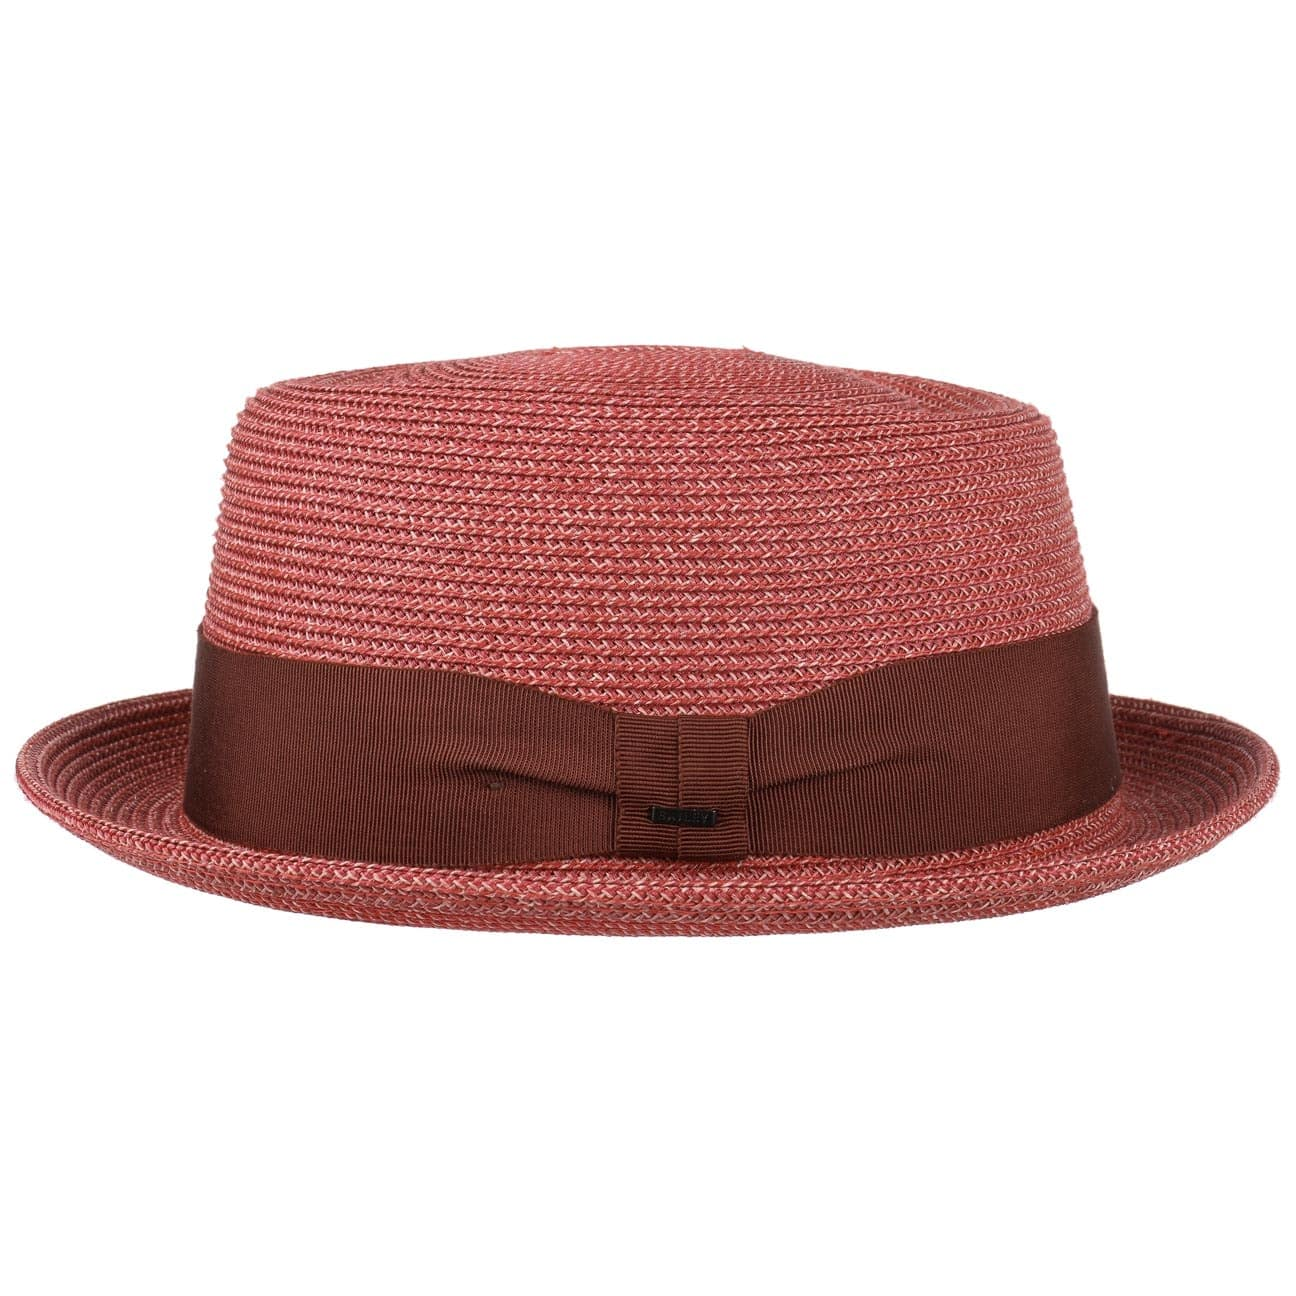 Sombrero Waits by Bailey of Hollywood